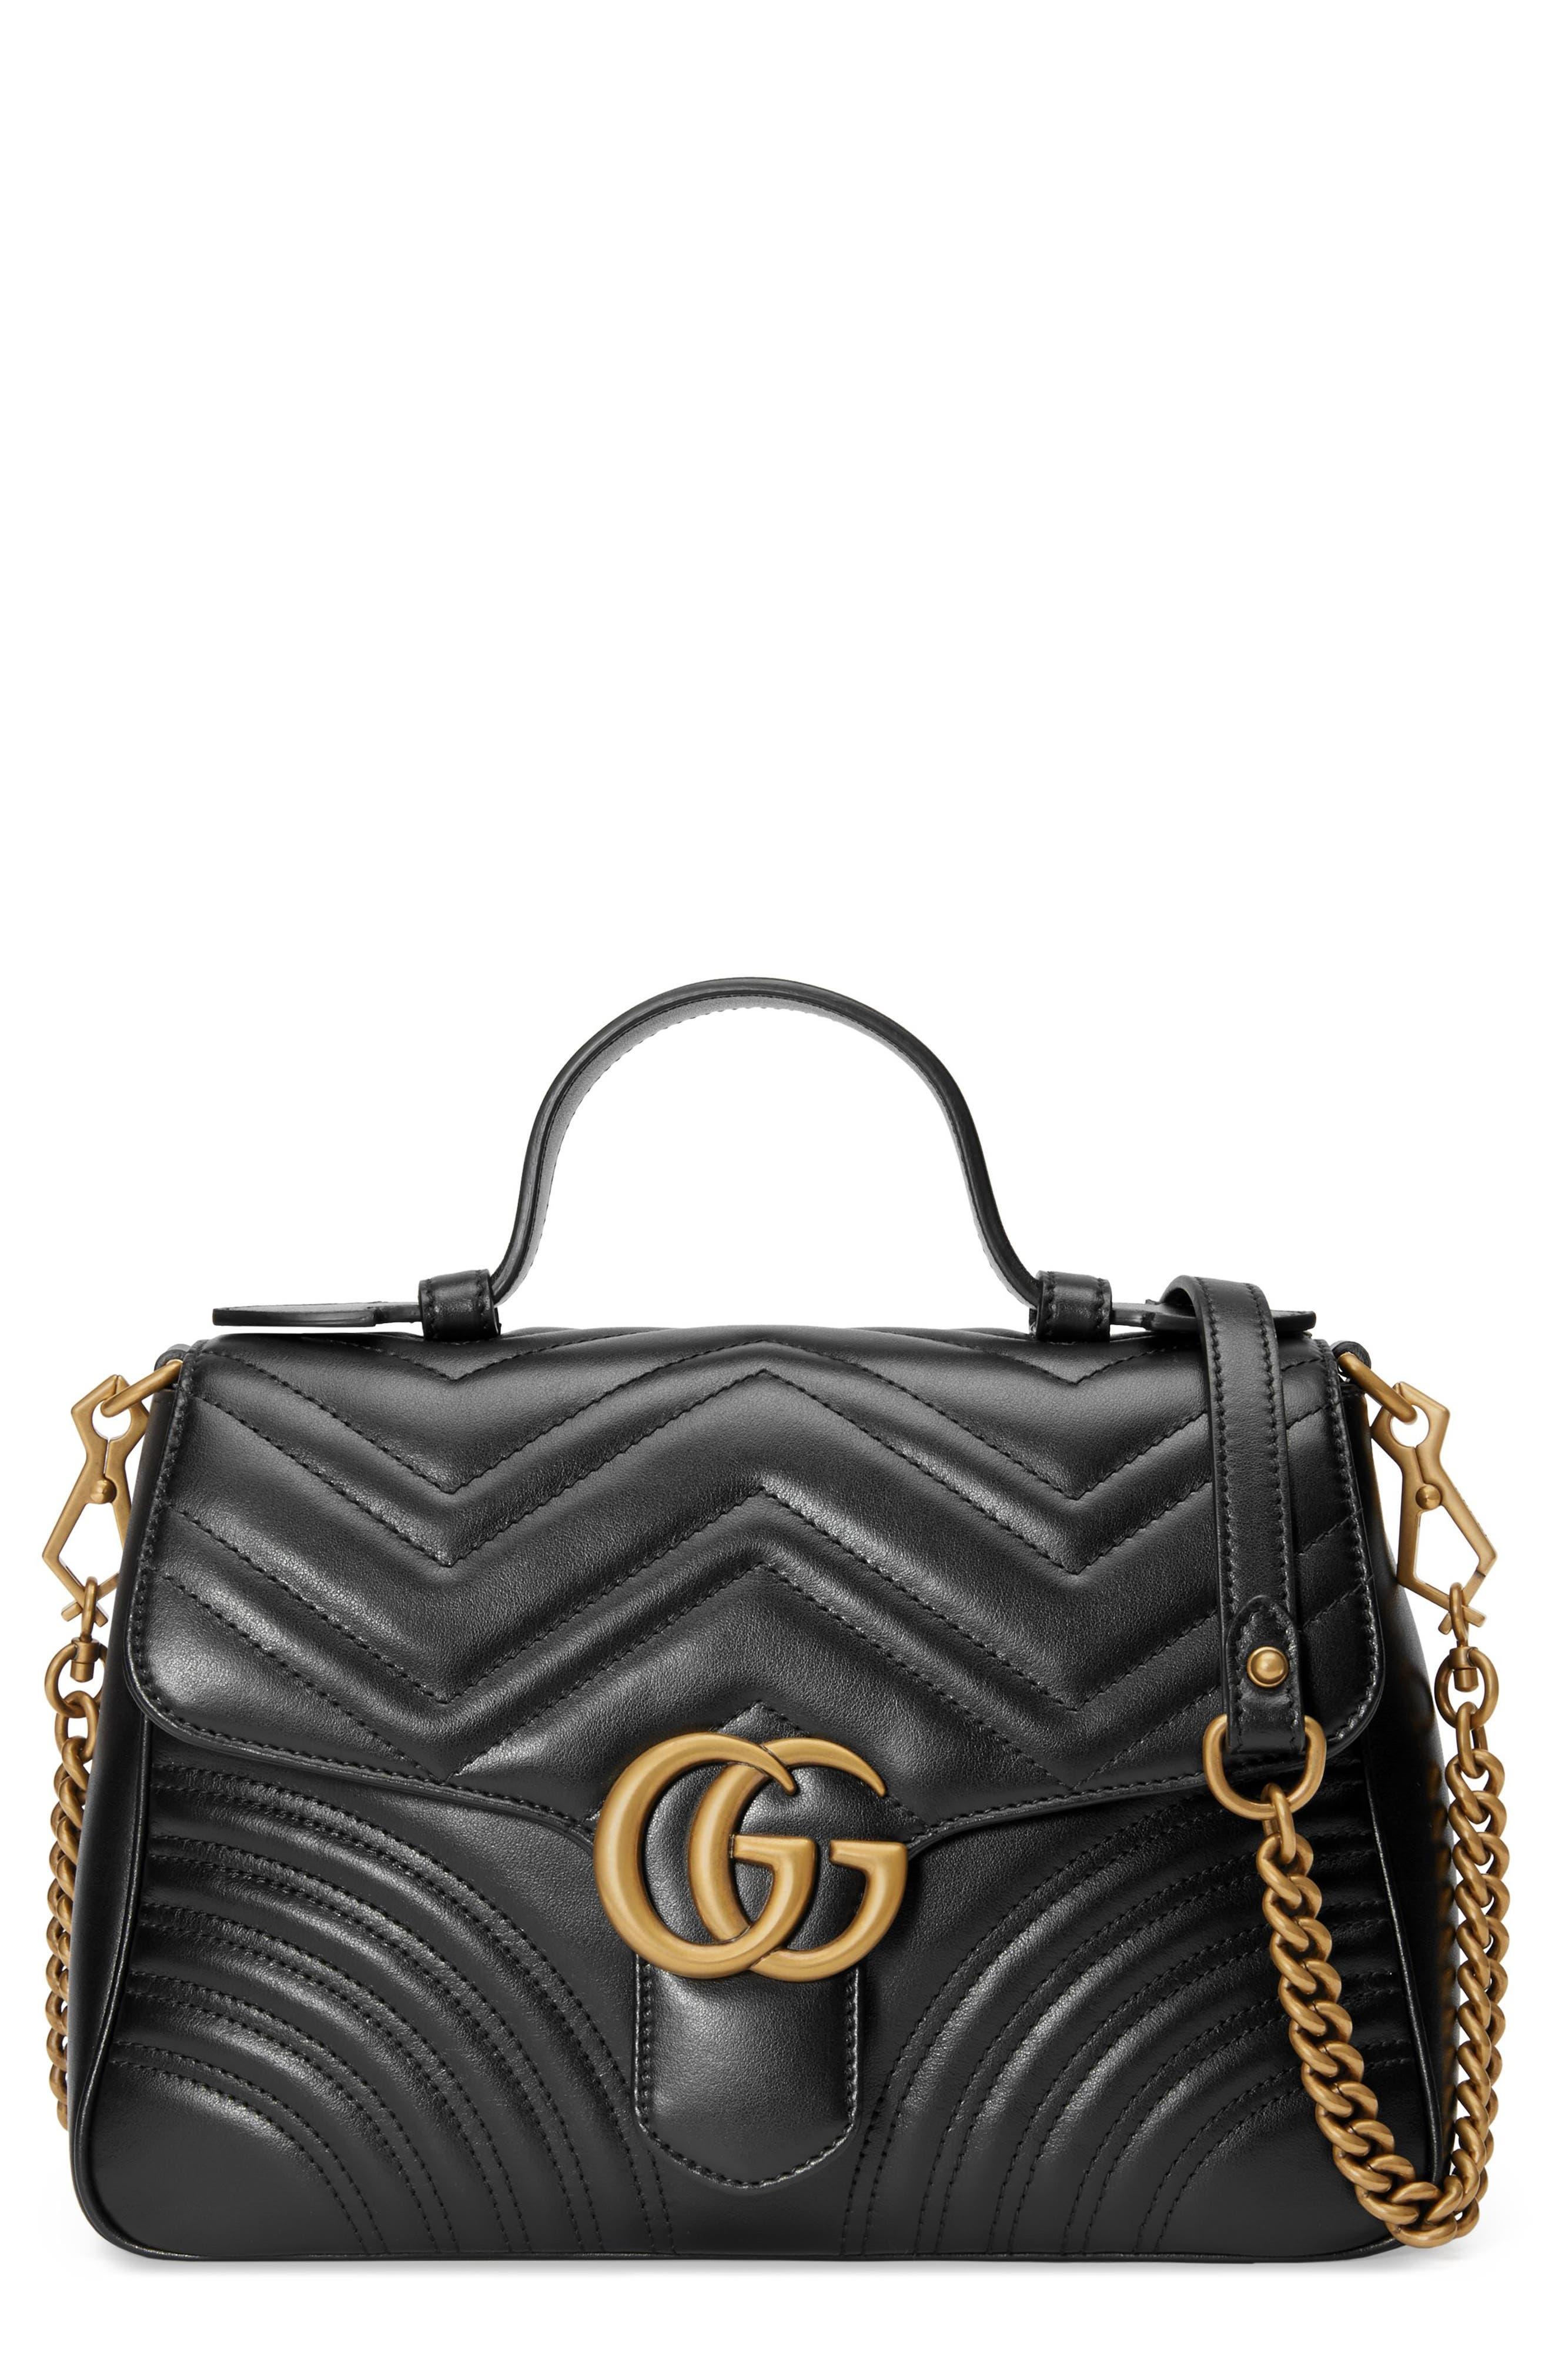 Small GG Marmont 2.0 Matelassé Leather Top Handle Bag,                             Main thumbnail 1, color,                             NERO